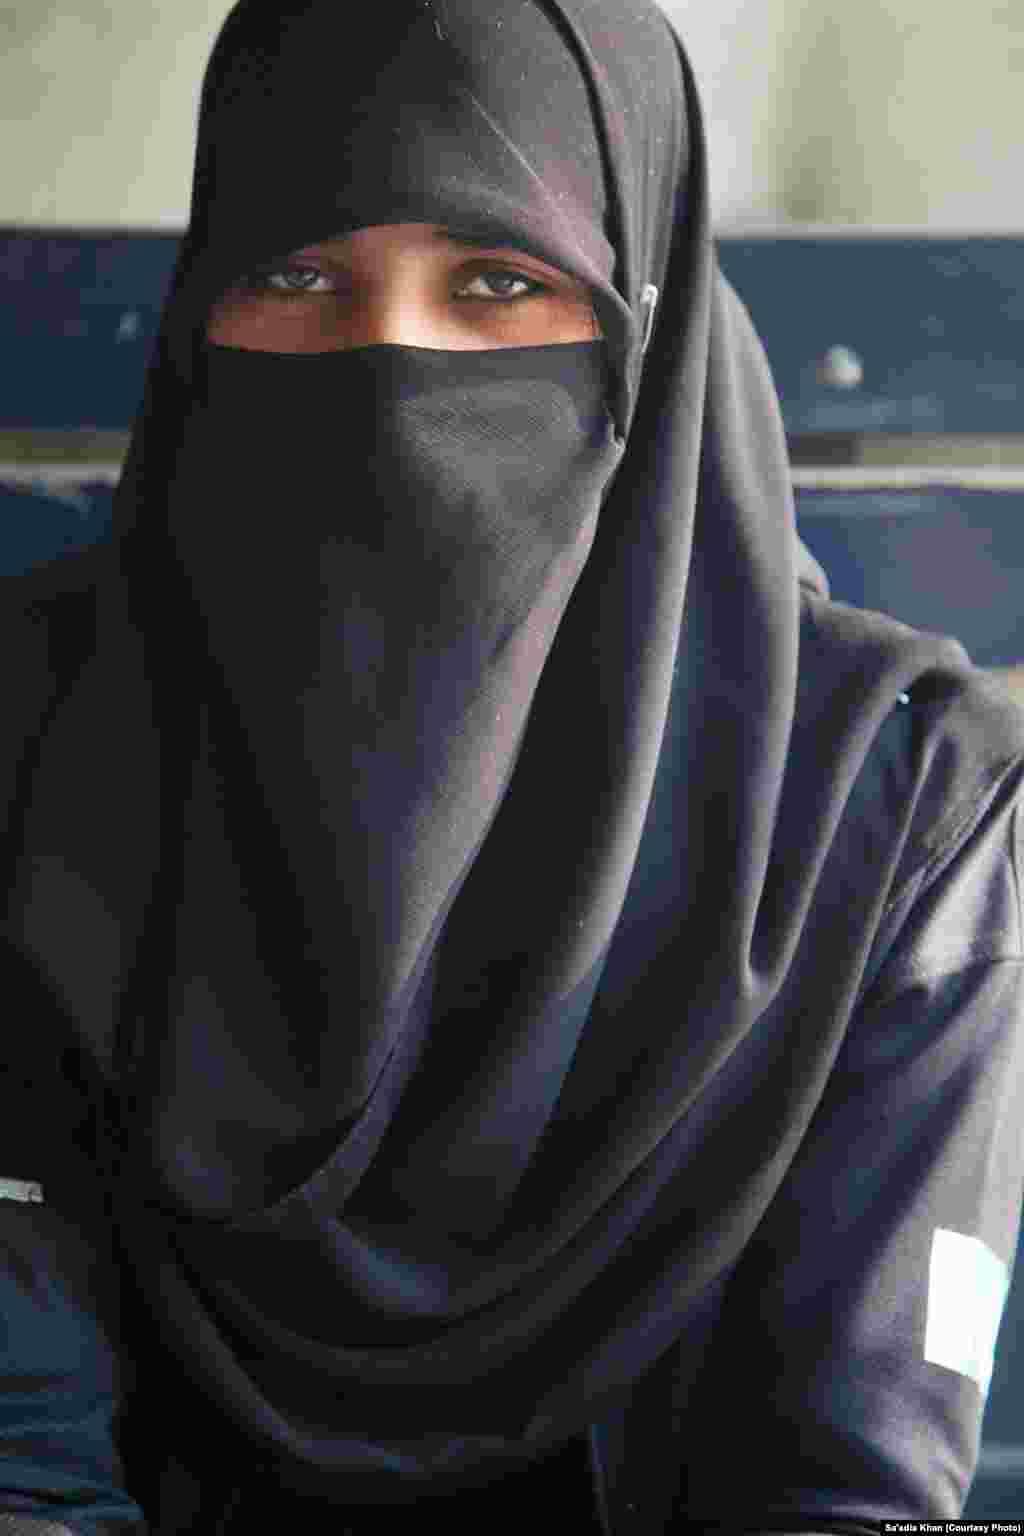 A female police commando wearing Niqab, a full Islamic veil.